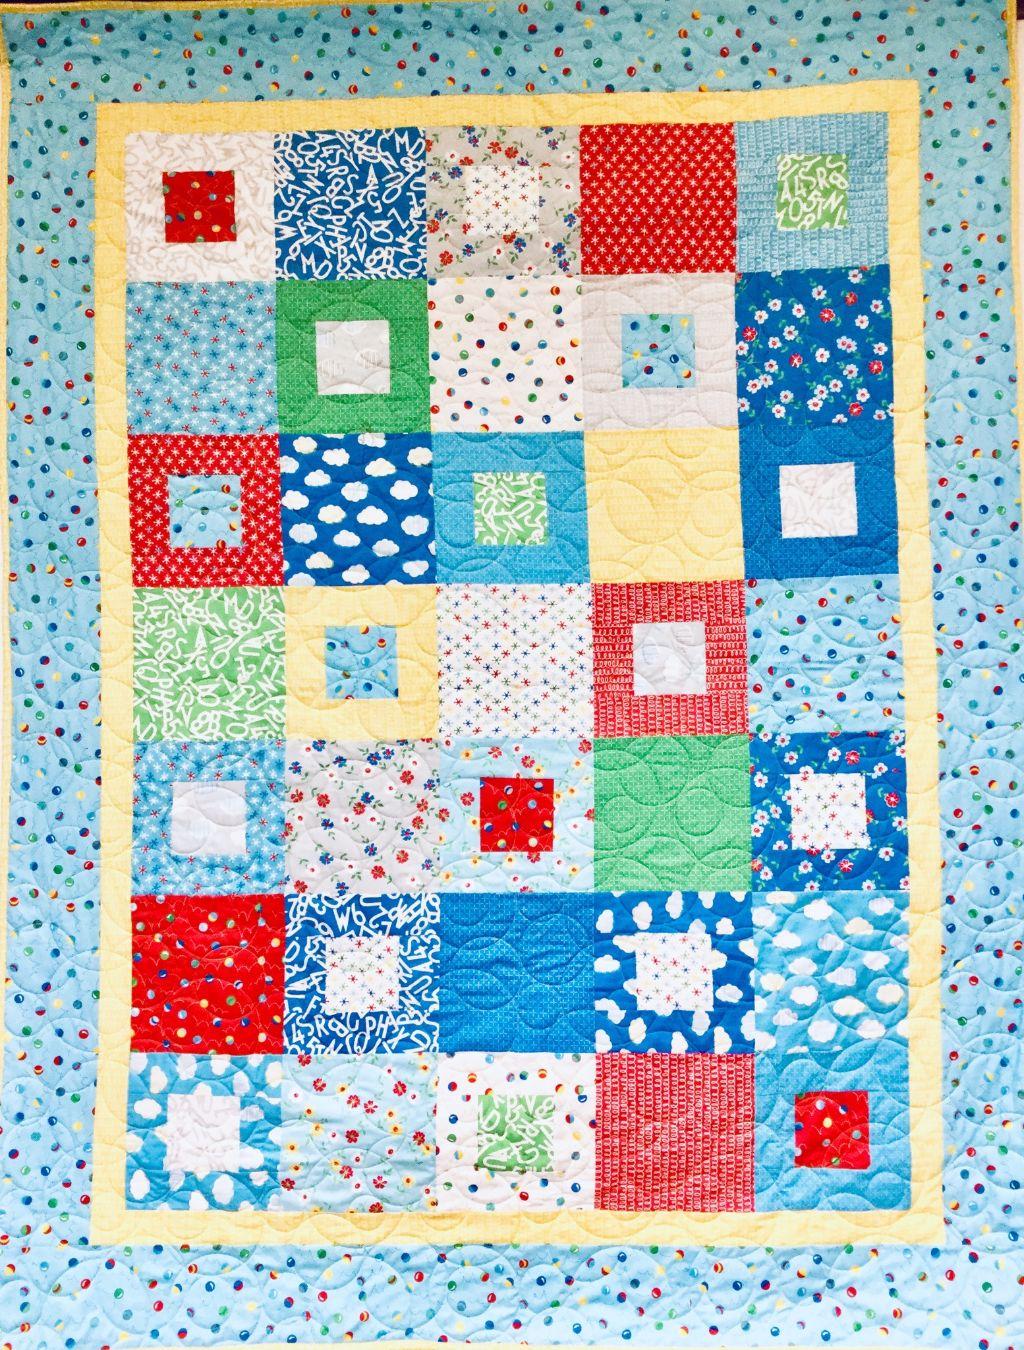 Bounce - Pandemonium  Quilt 63 x 82